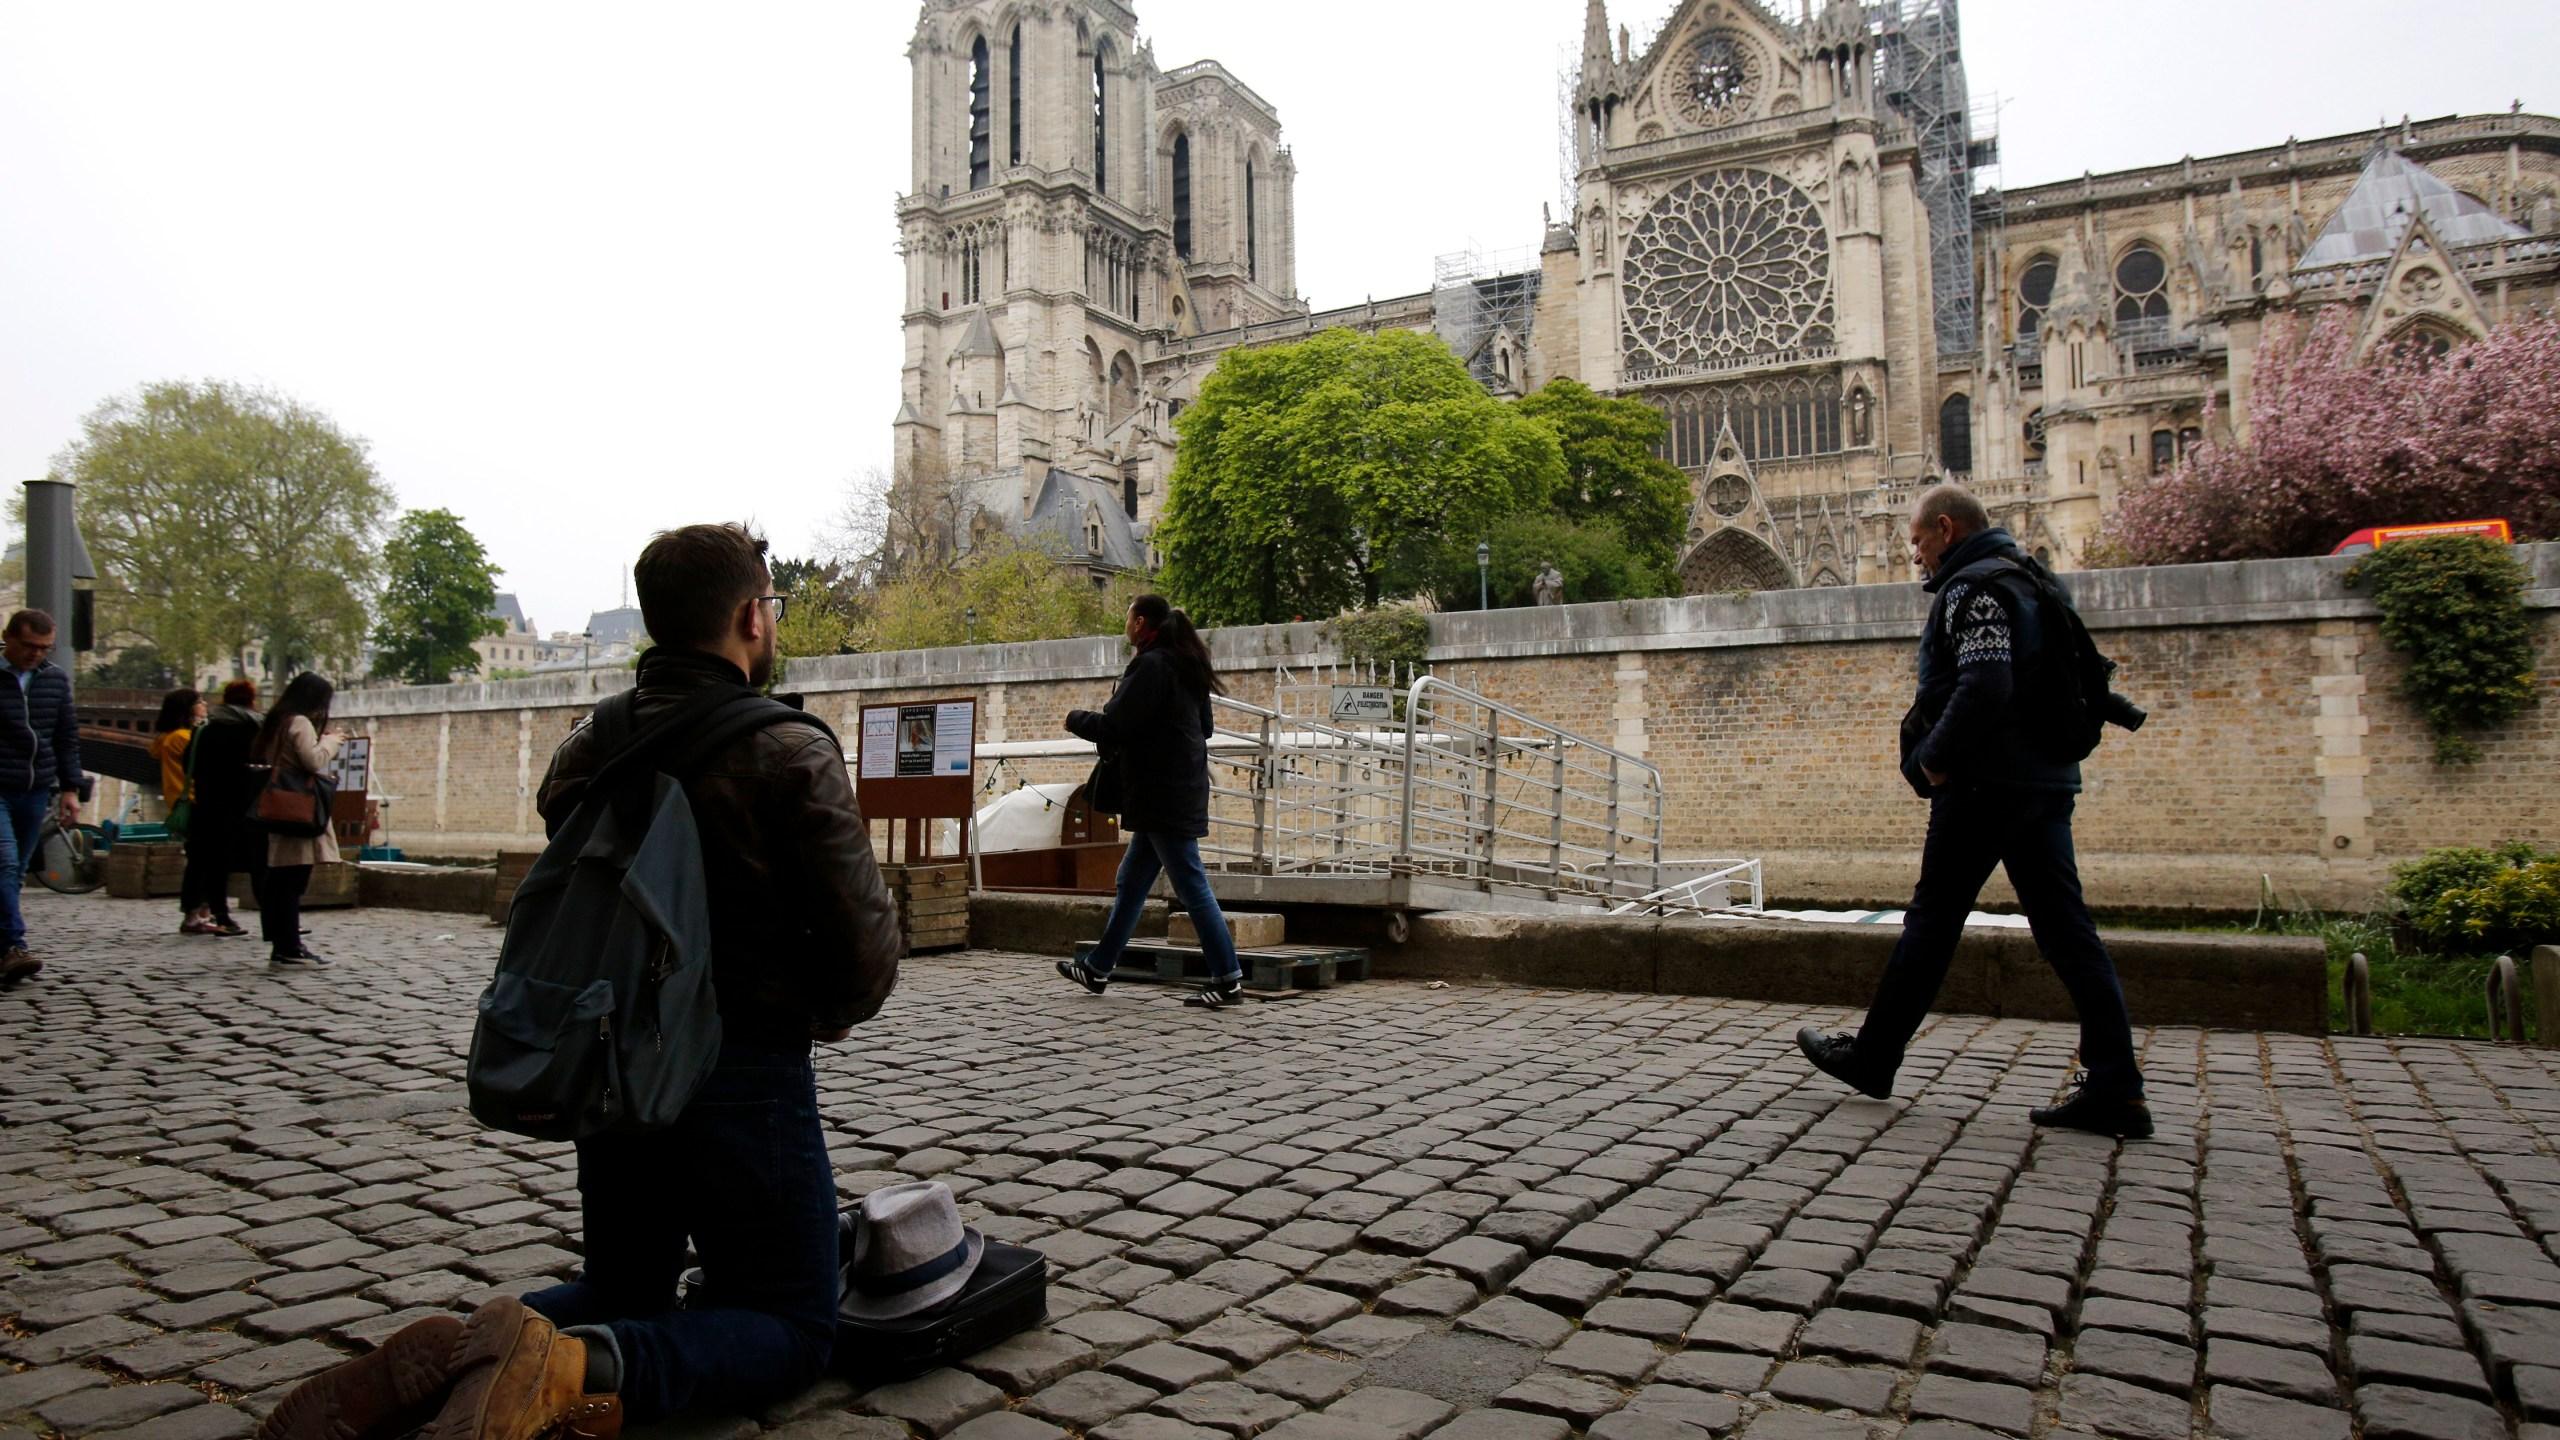 APTOPIX_France_Notre_Dame_Fire_59866-159532.jpg06626926